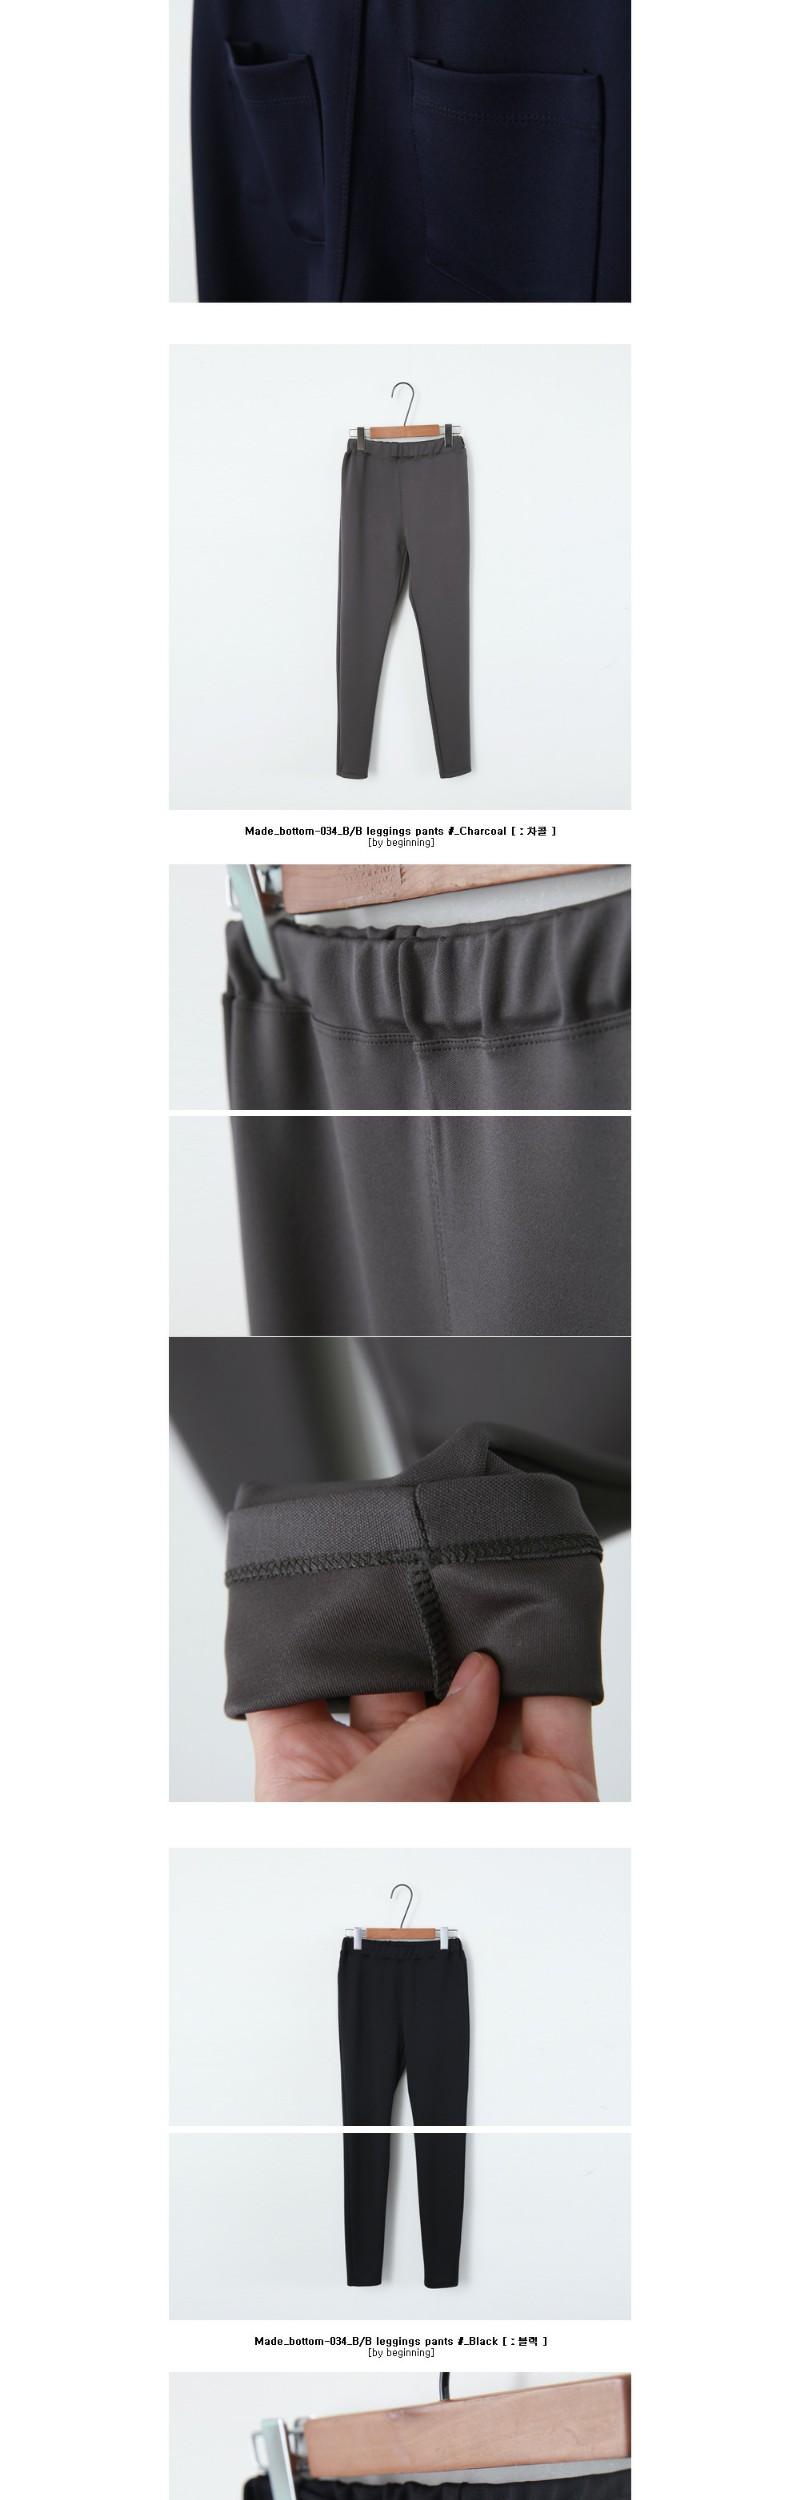 Made_bottom-034_B/B leggings pants